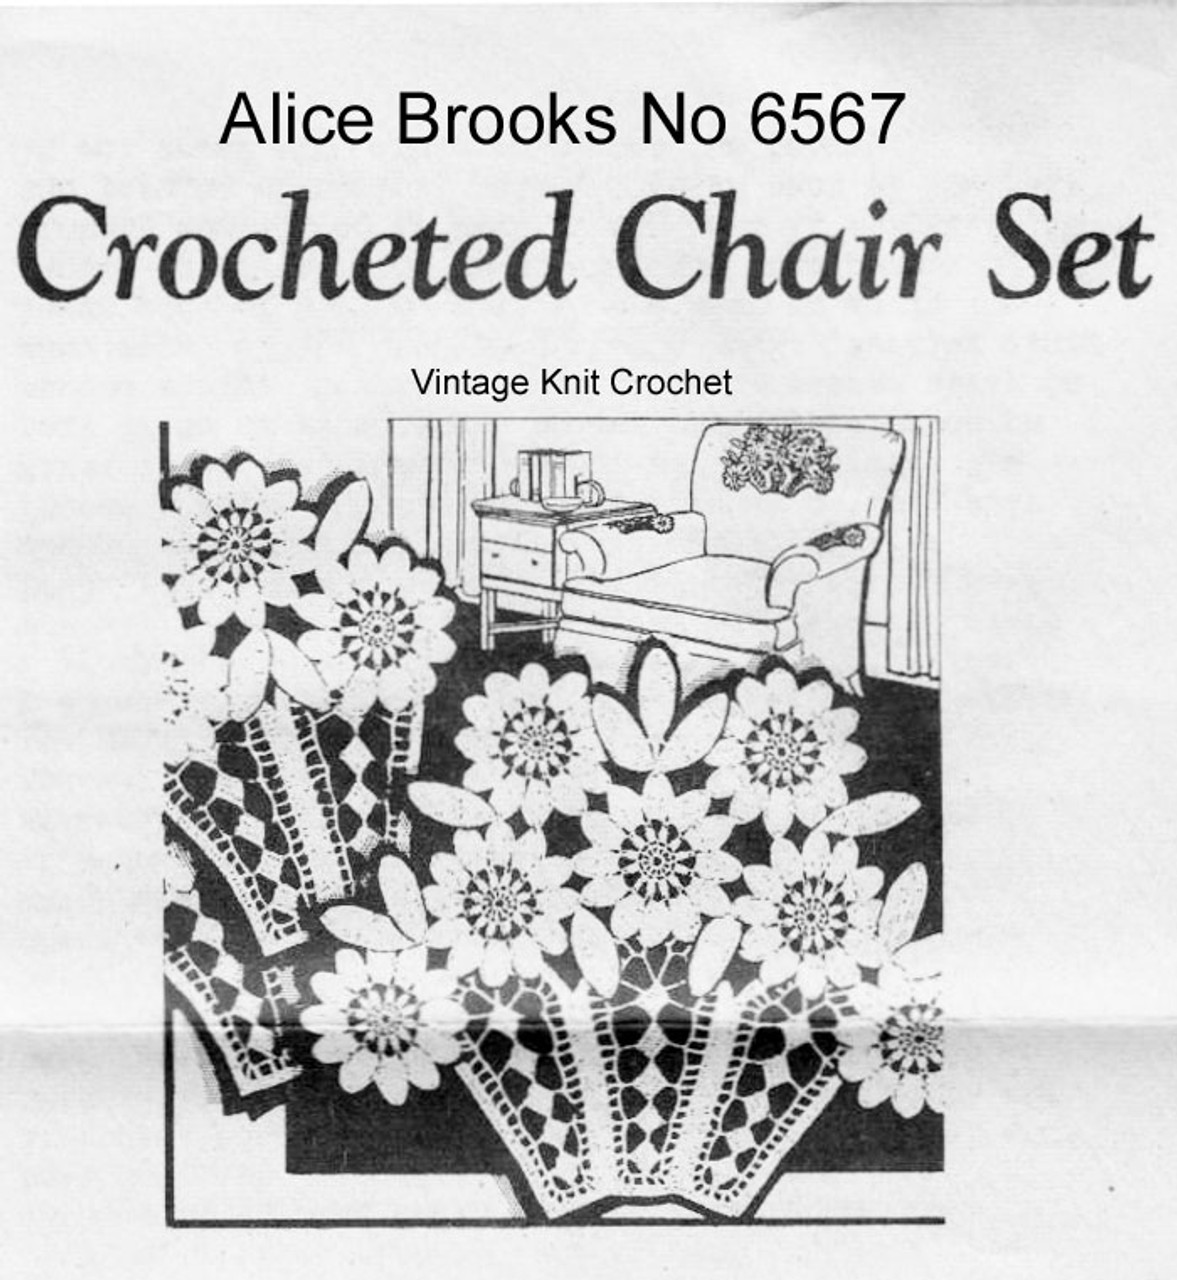 Vintage Flower Basket Chair Set, Alice Brooks 6567